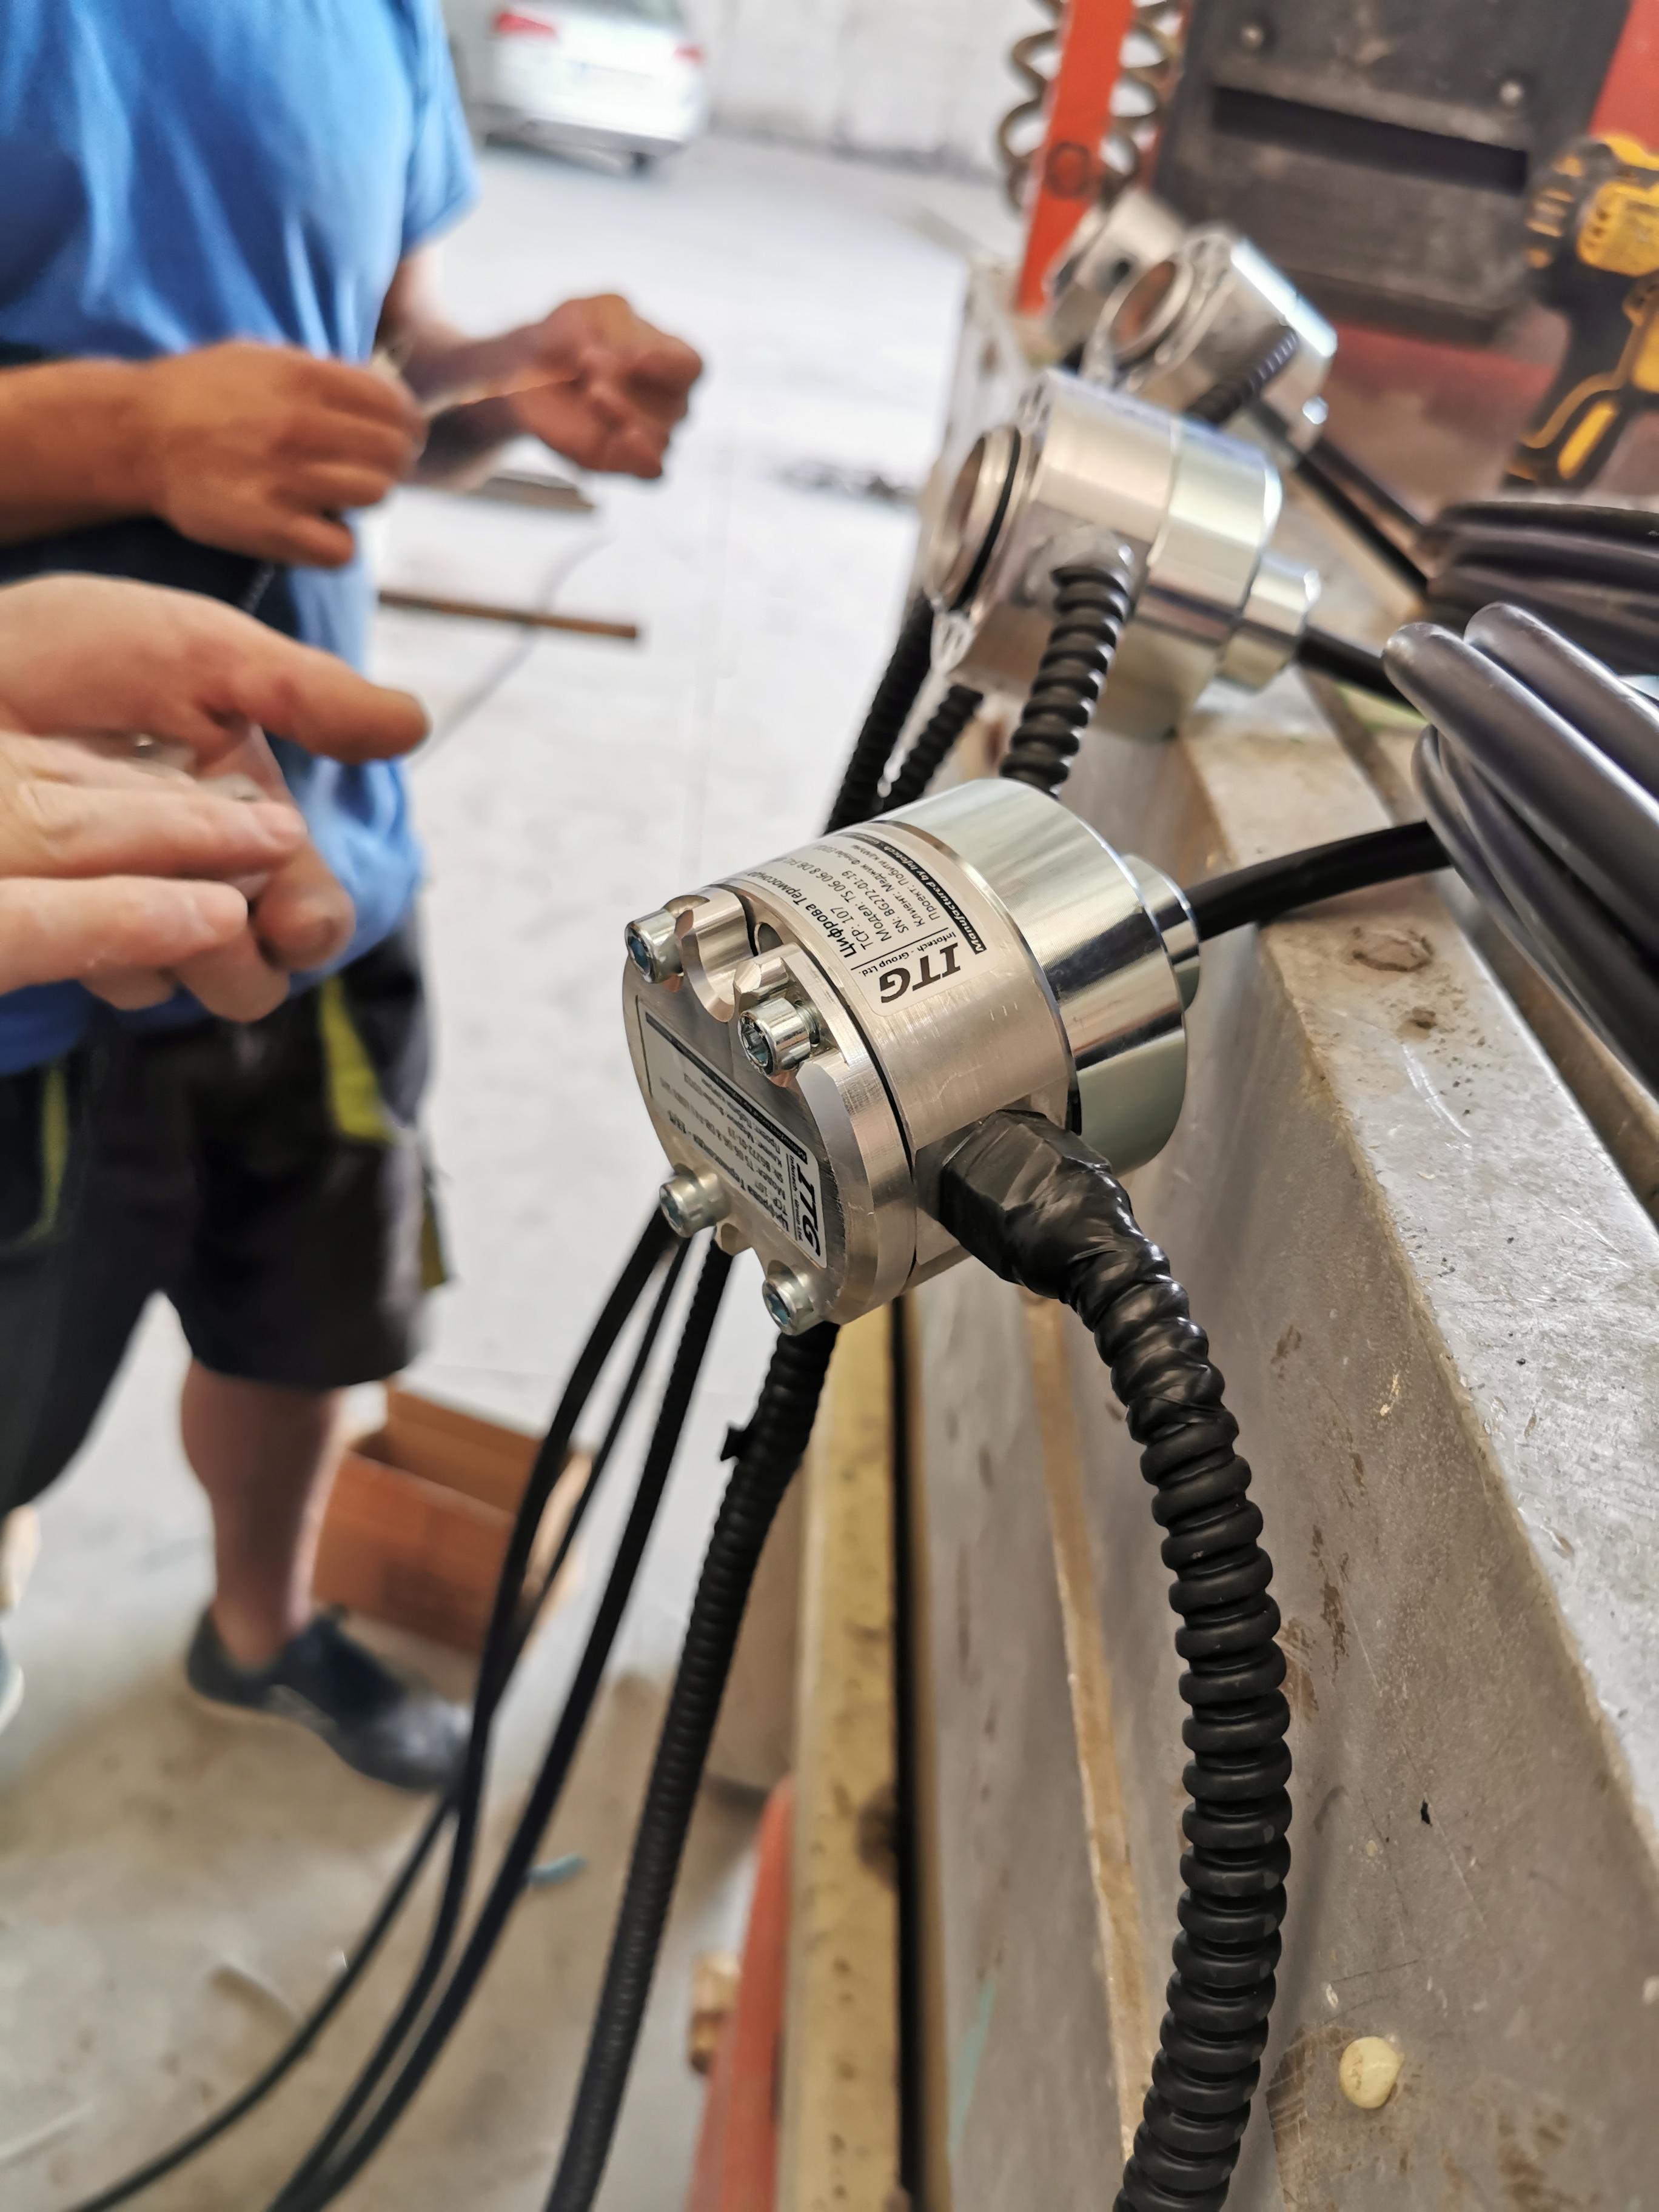 ITG grain silo temperature monitoring systems - installation Термометрії силосів і сховищ під зерно ITG | Установка